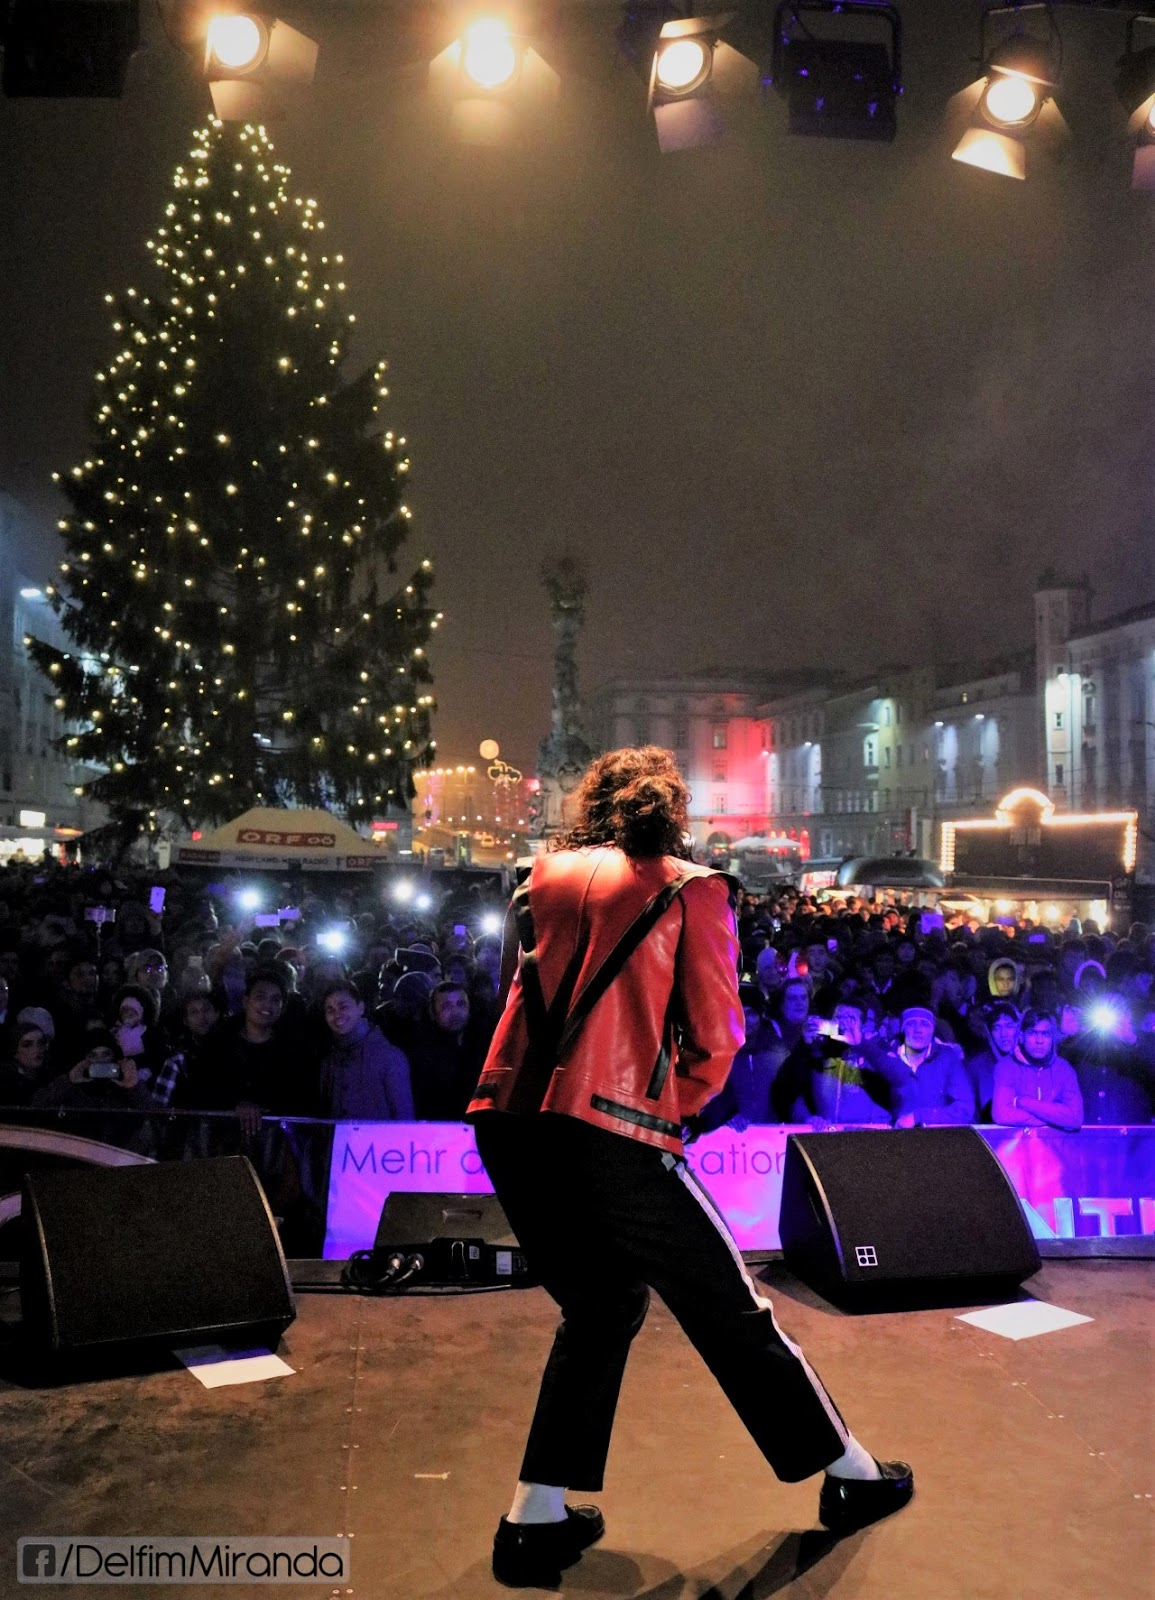 Delfim Miranda - Michael Jackson Tribute - Thriller - Live in Austria - New Years Eve